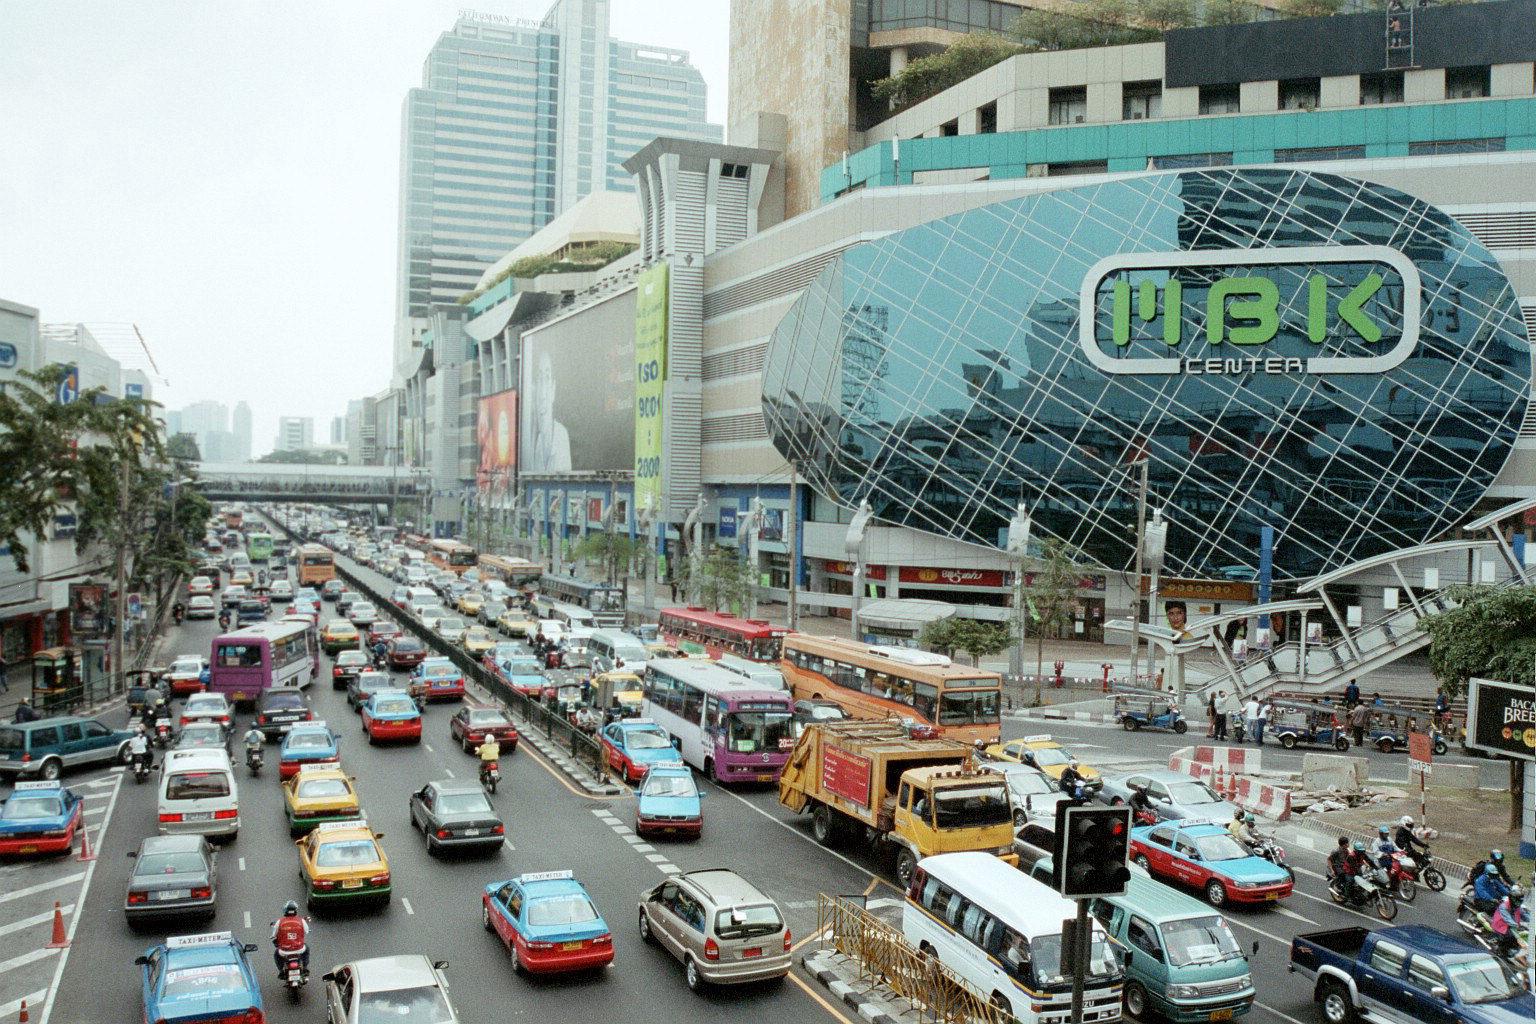 ASIAN BEST HOTELS: MBK Shopping Center - Bangkok